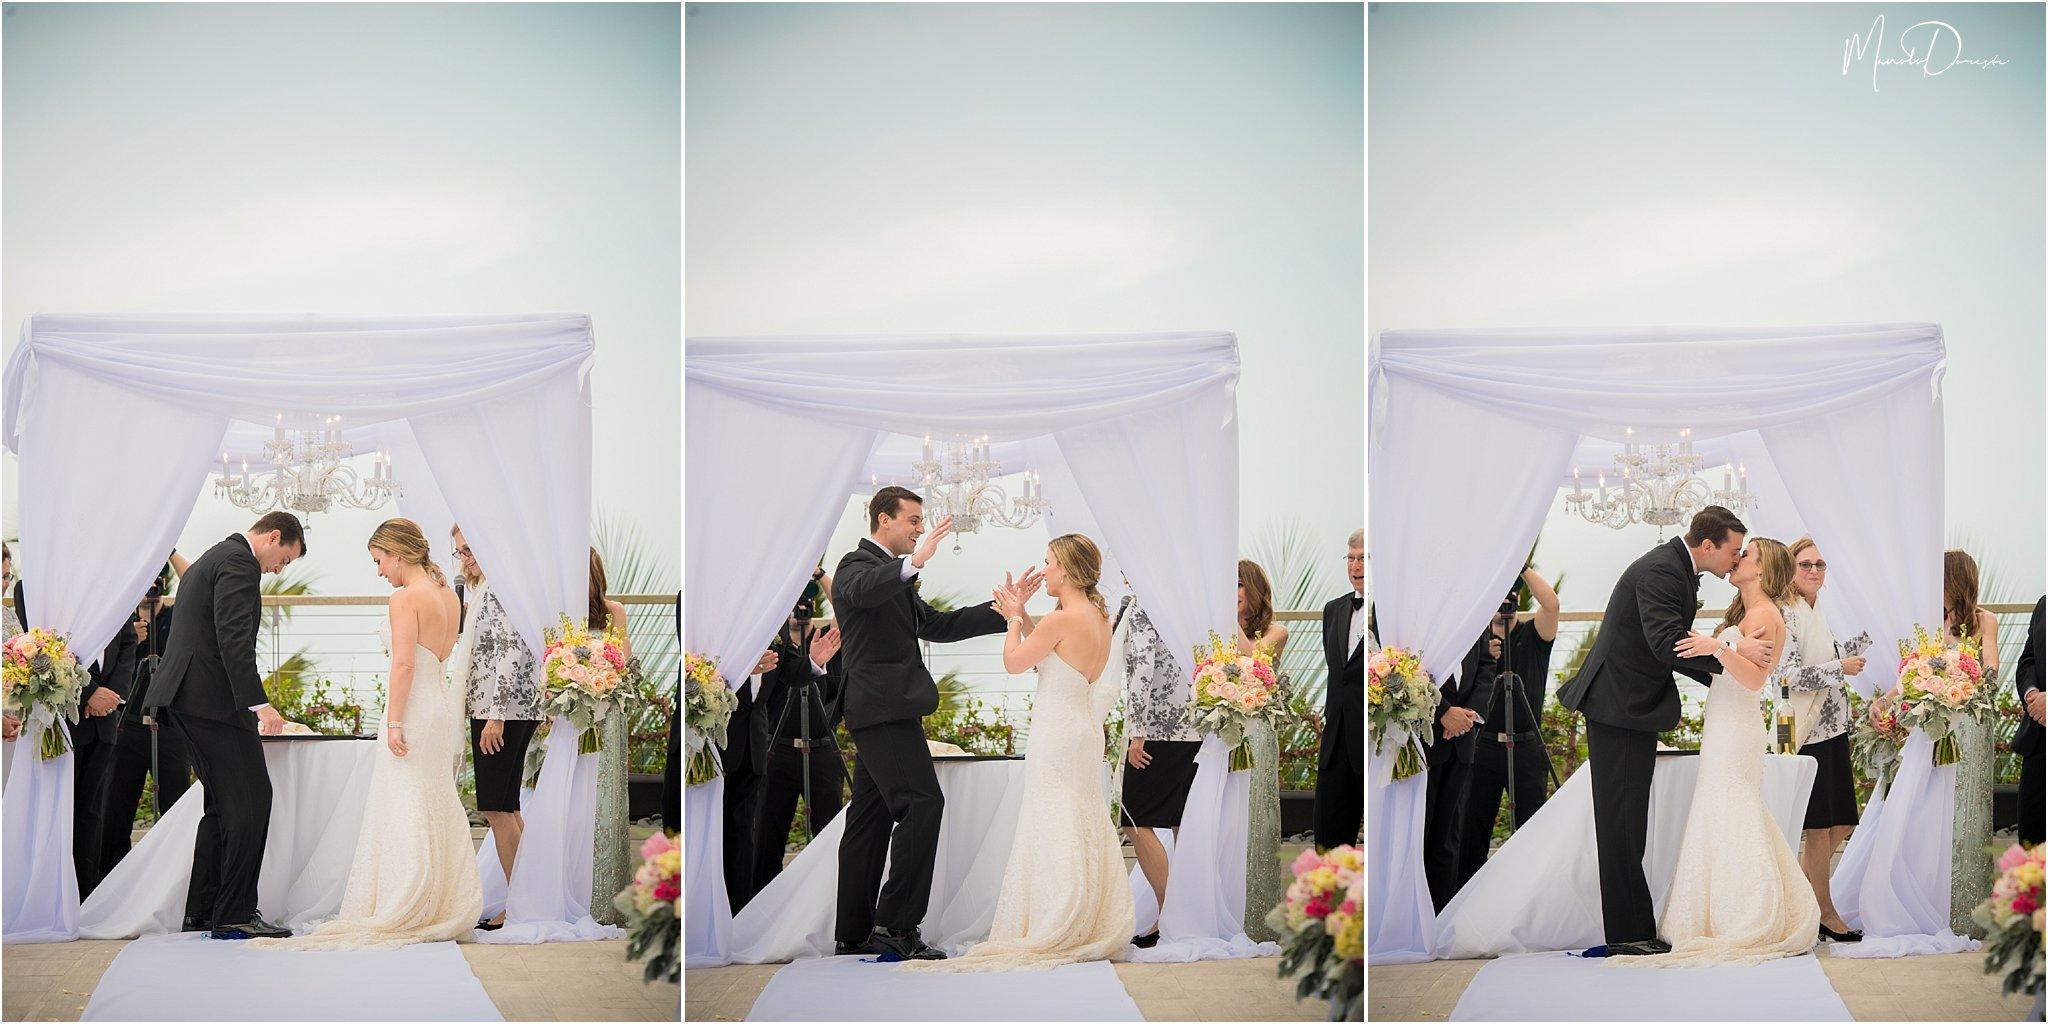 0671_ManoloDoreste_InFocusStudios_Wedding_Family_Photography_Miami_MiamiPhotographer.jpg